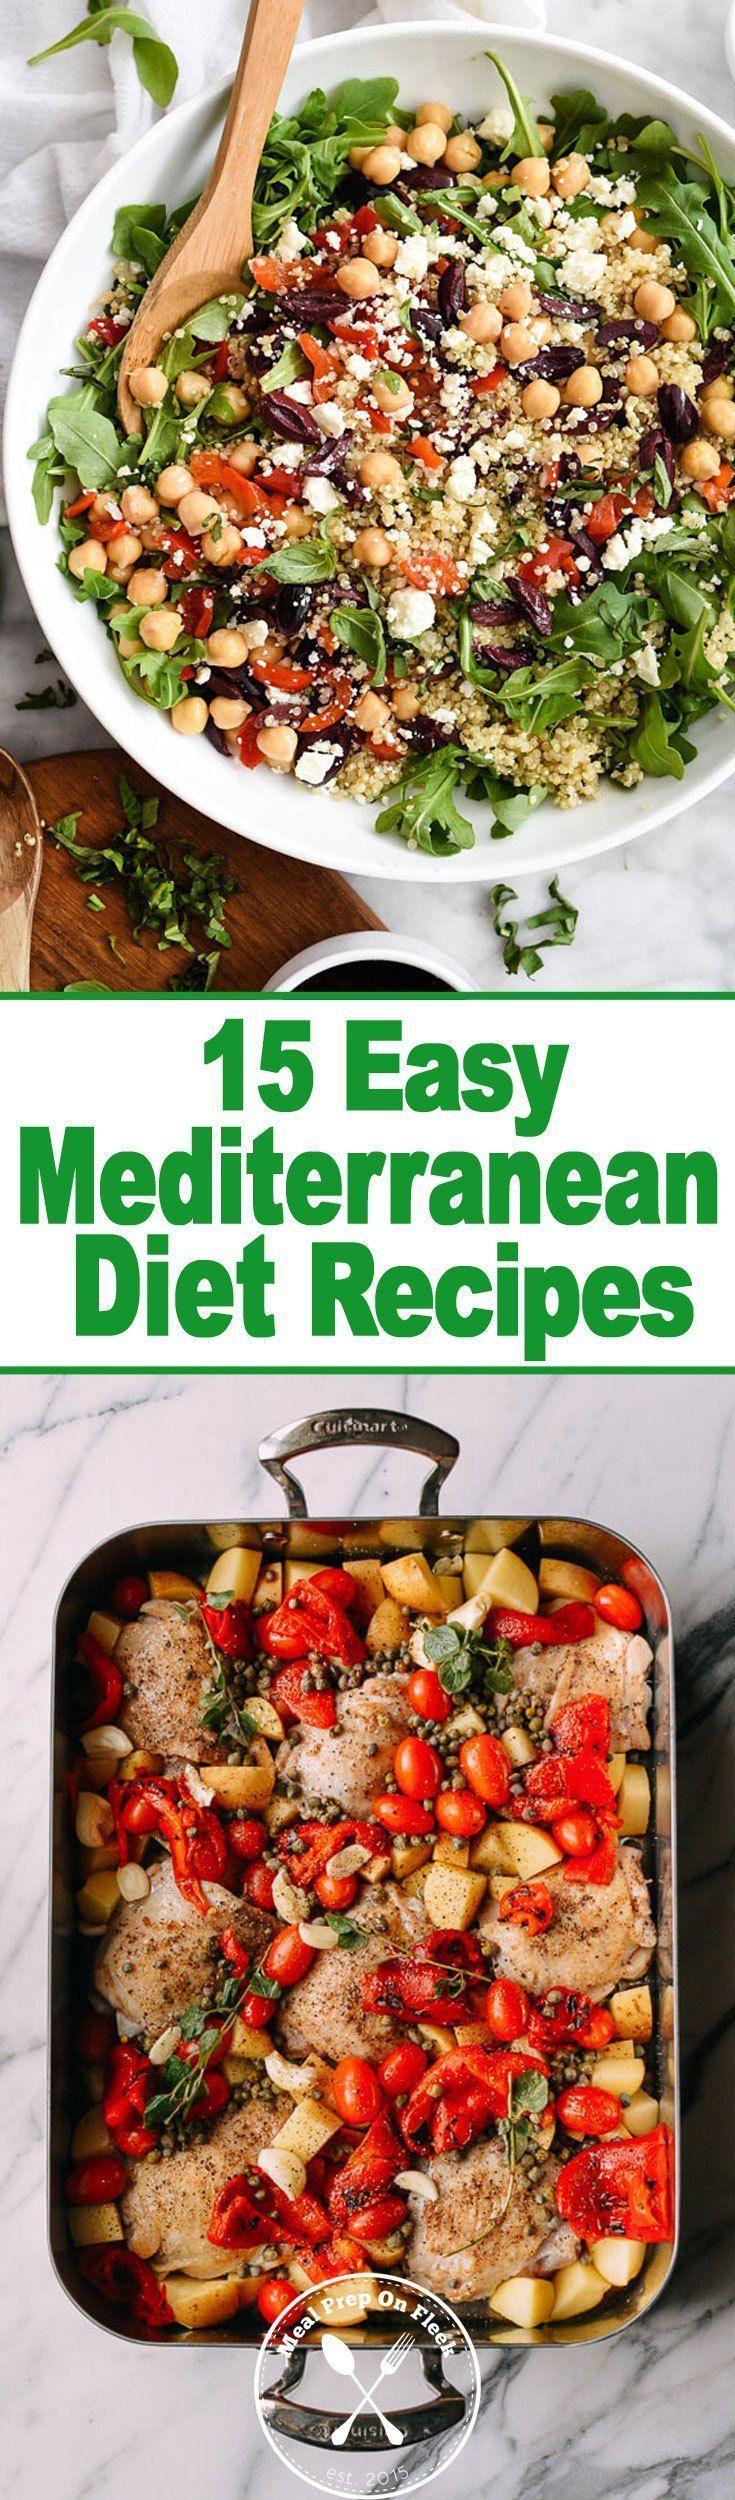 Easy-Mediterranean Diet Meal Prep Recipes